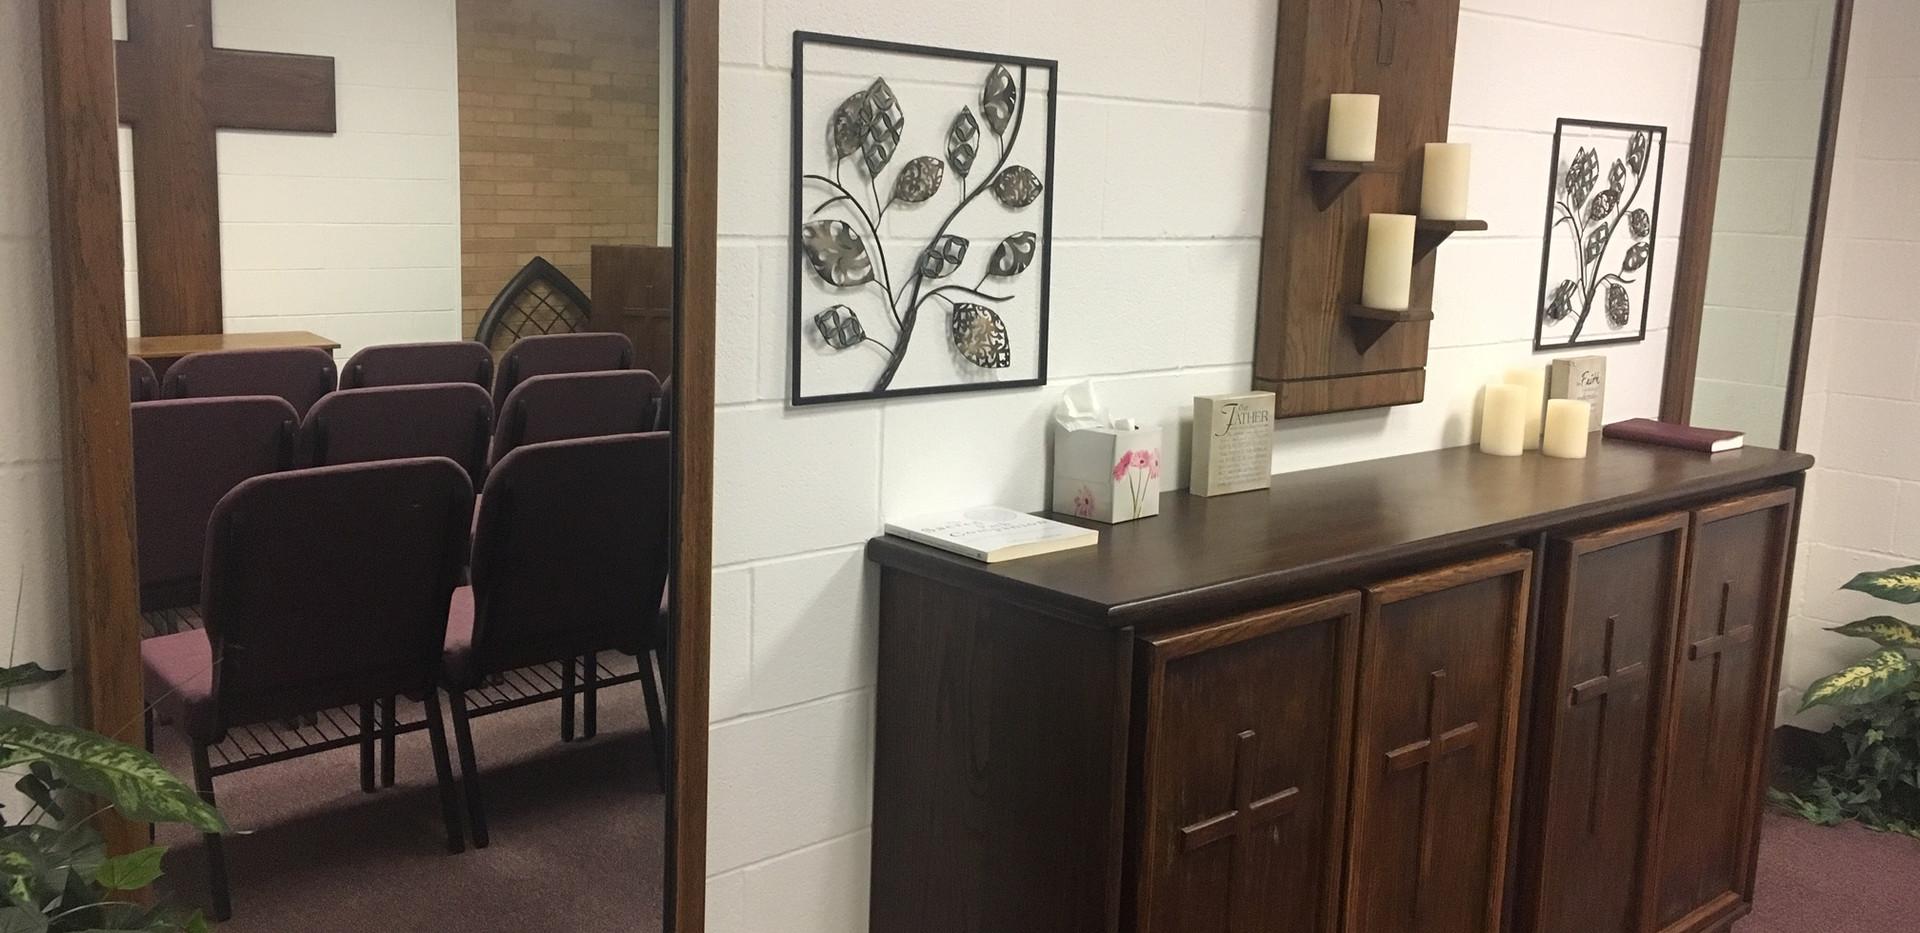 chapel mirror image.jpeg